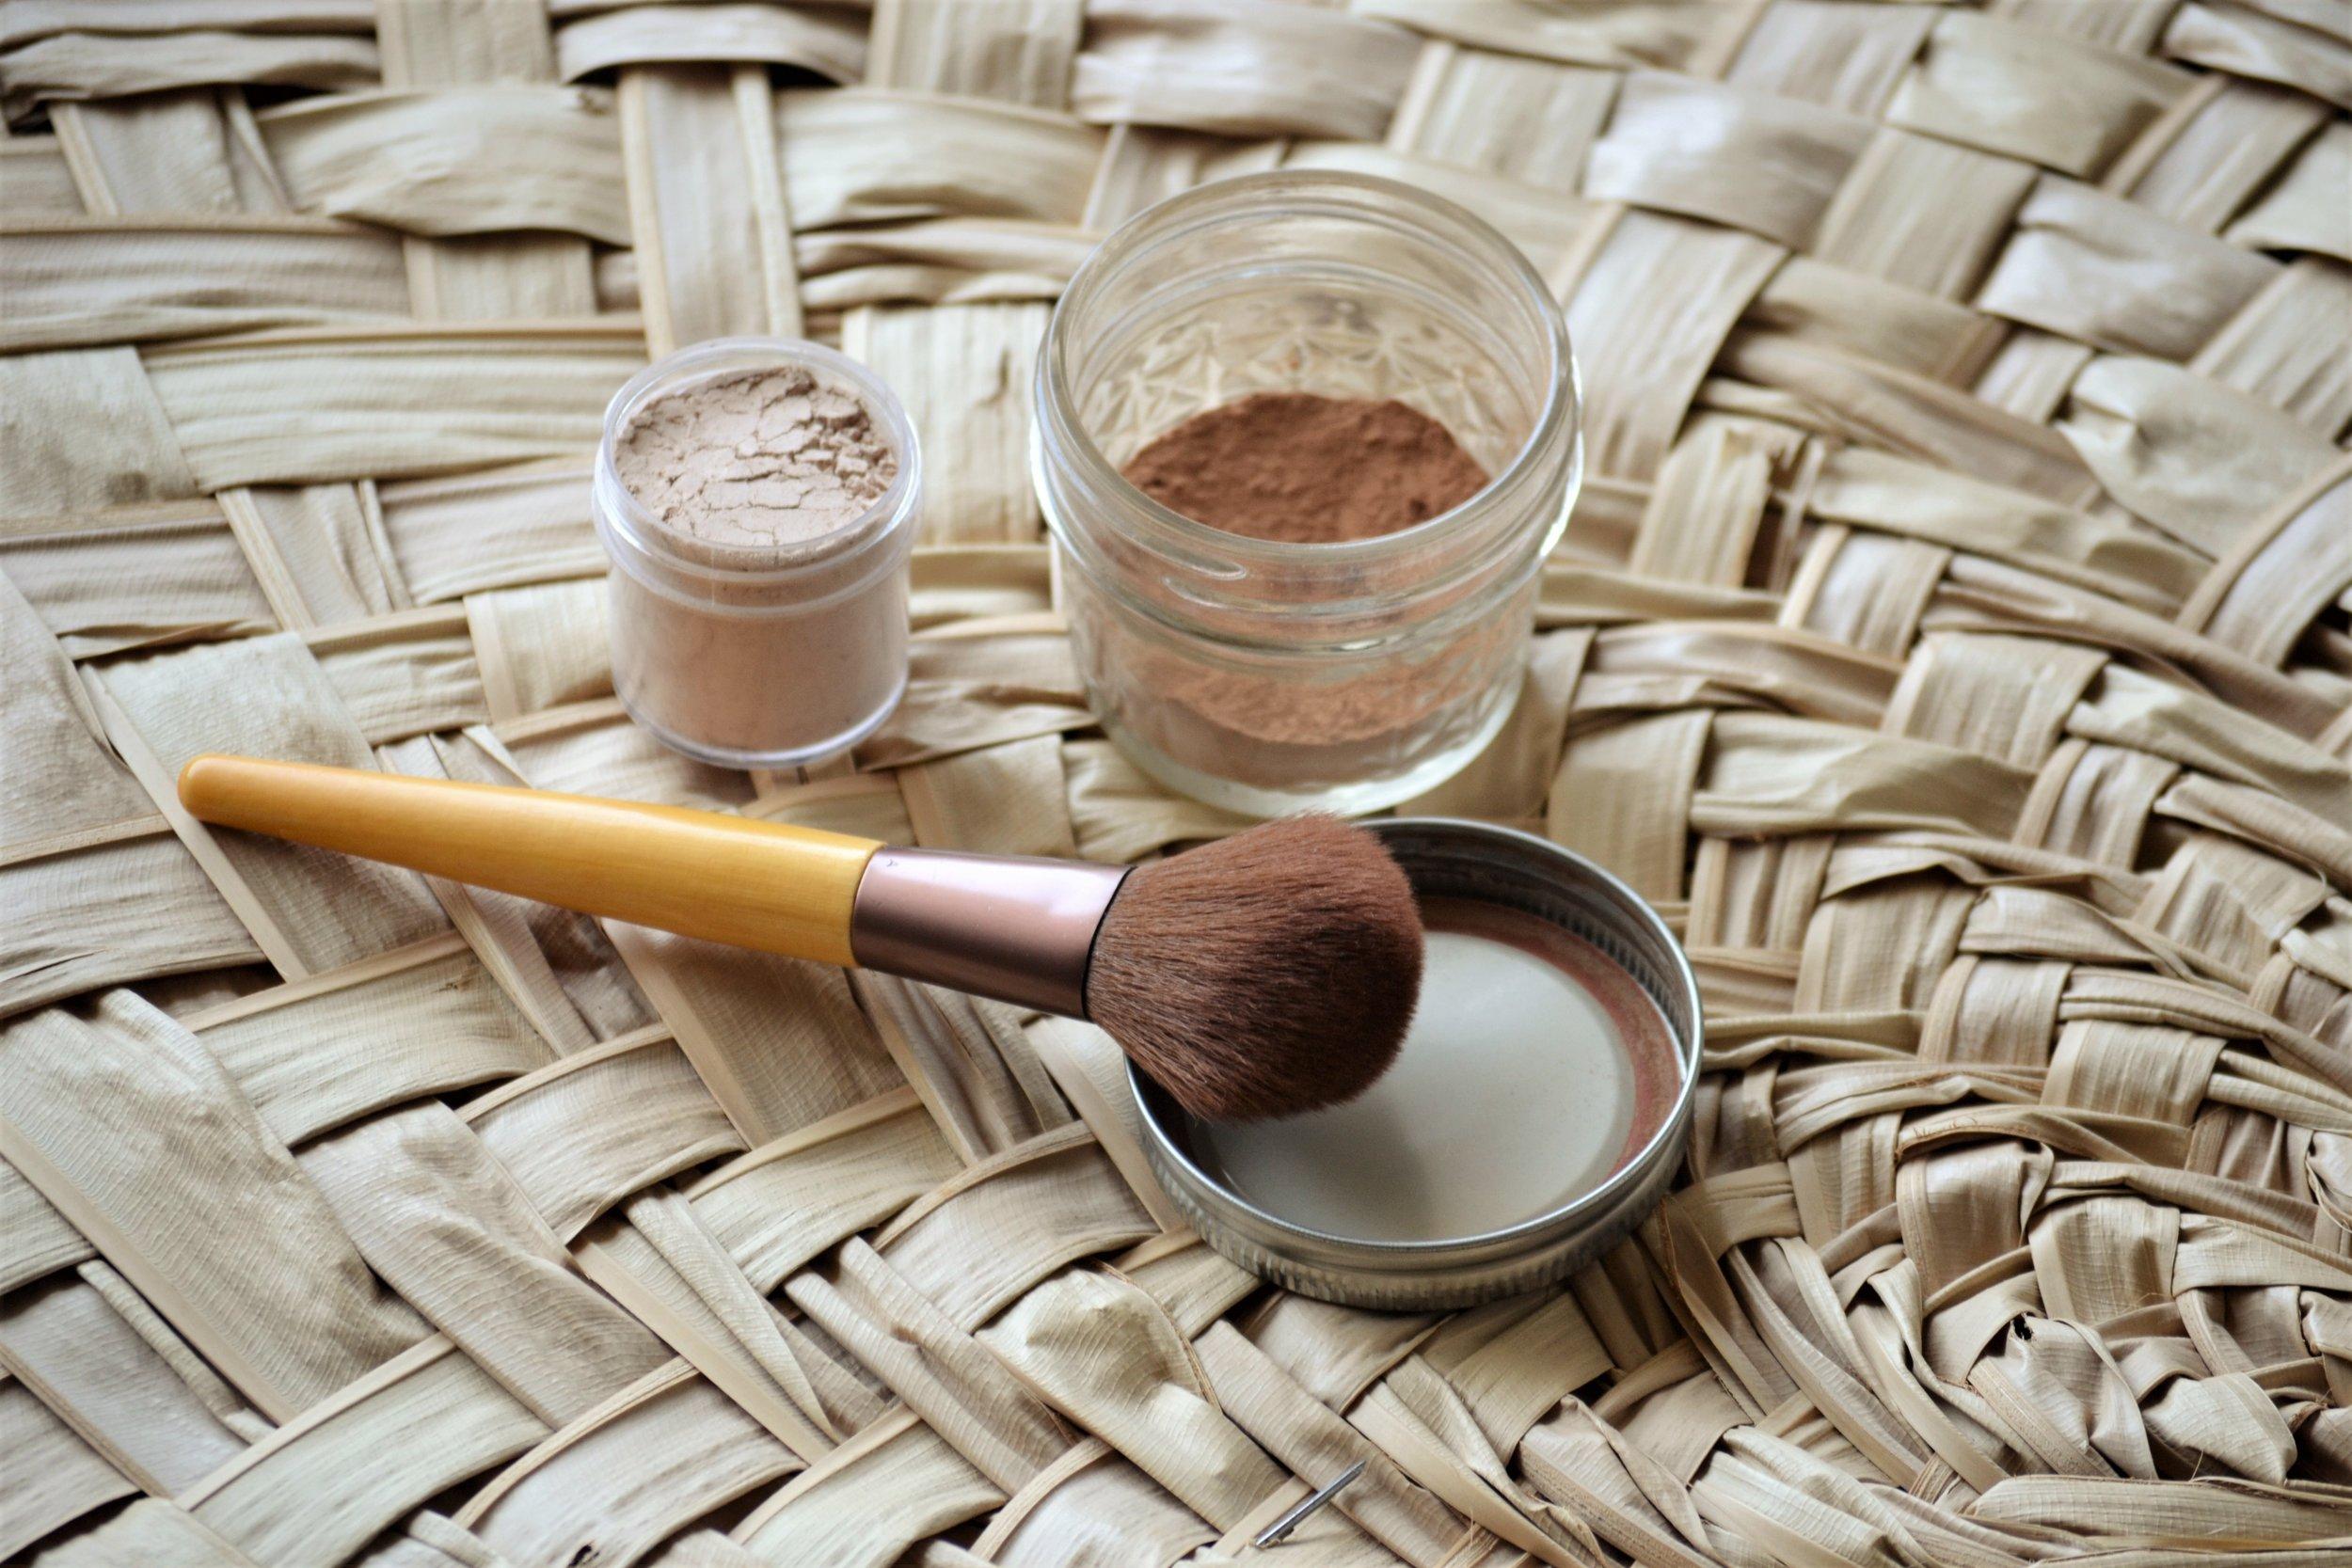 DIY Organic Beauty Products 01.JPG